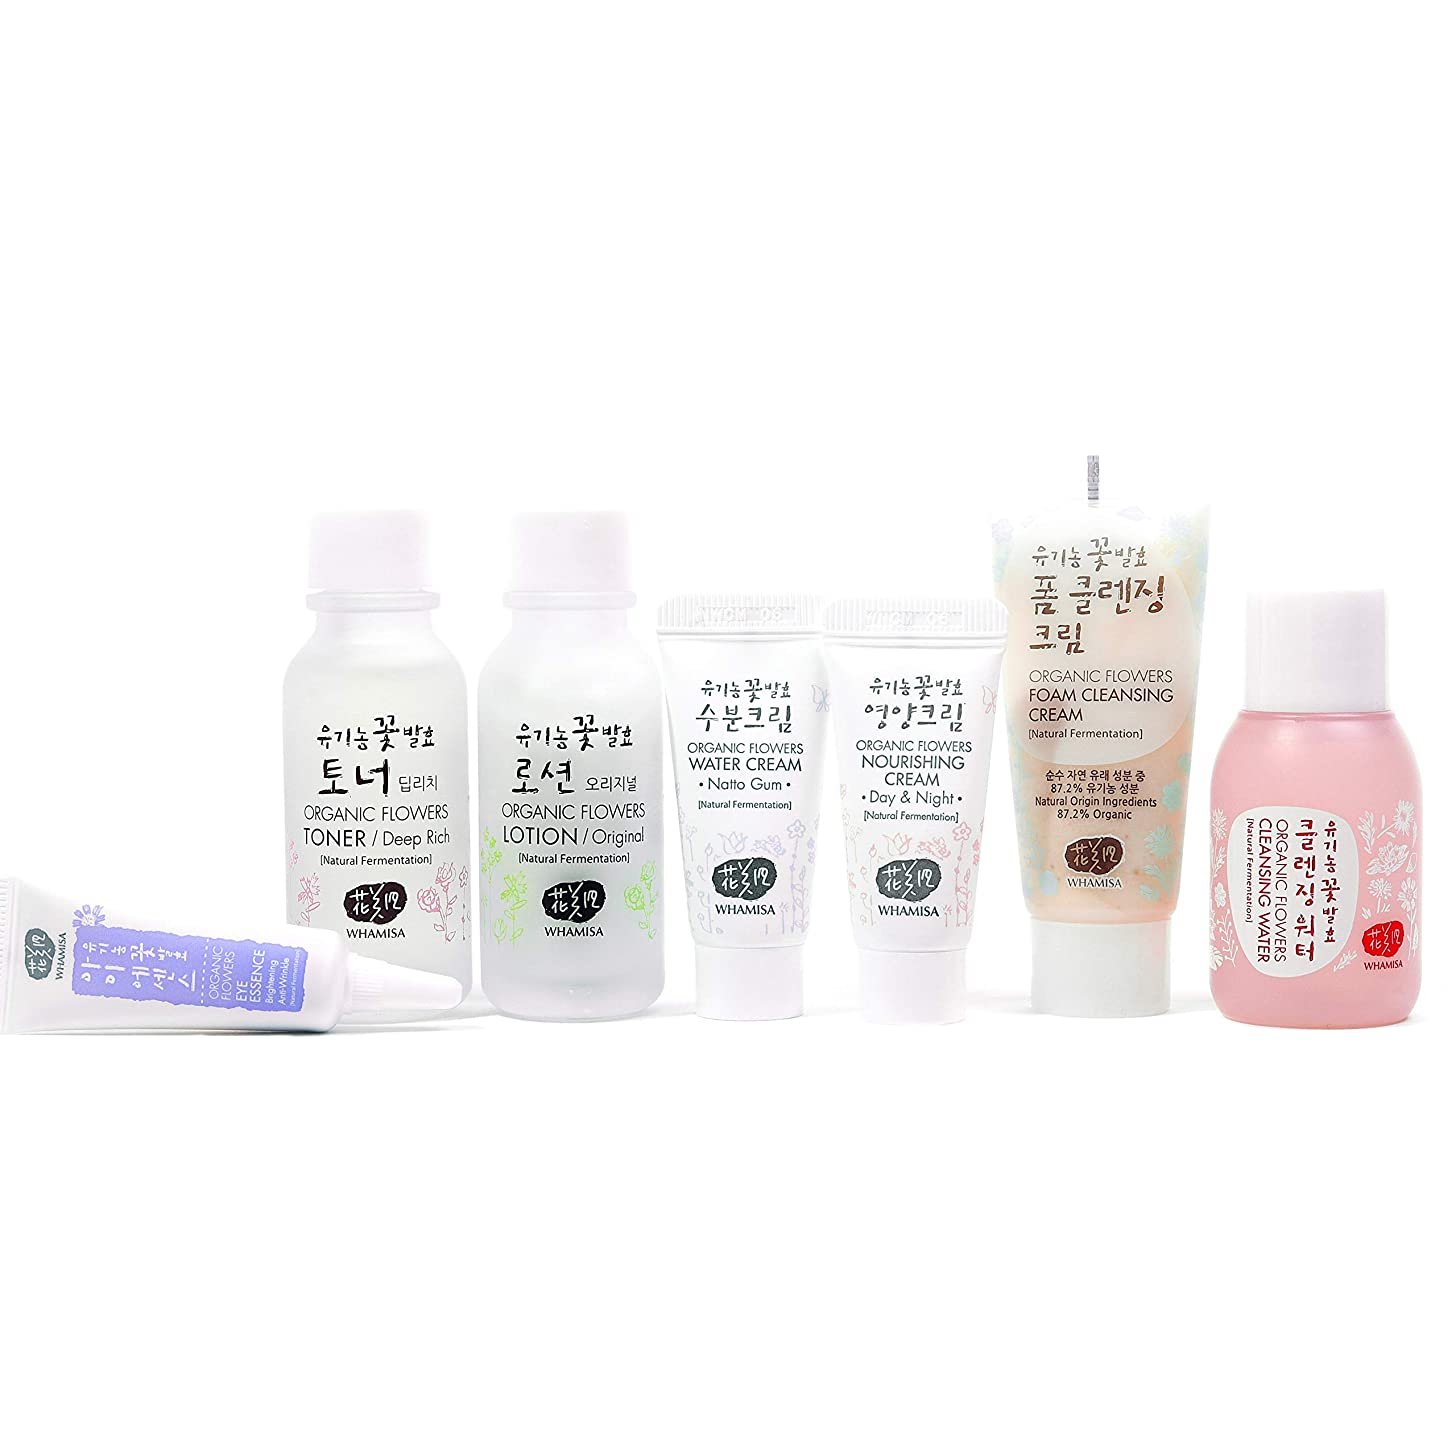 Whamisa Organic Flowers Travel and Trial Skincare Kit | Full Routine, 7 items | Certified Natural and Organic, EWG Verified | Cruelty-Free & Vegan | Korean Skincare Kit